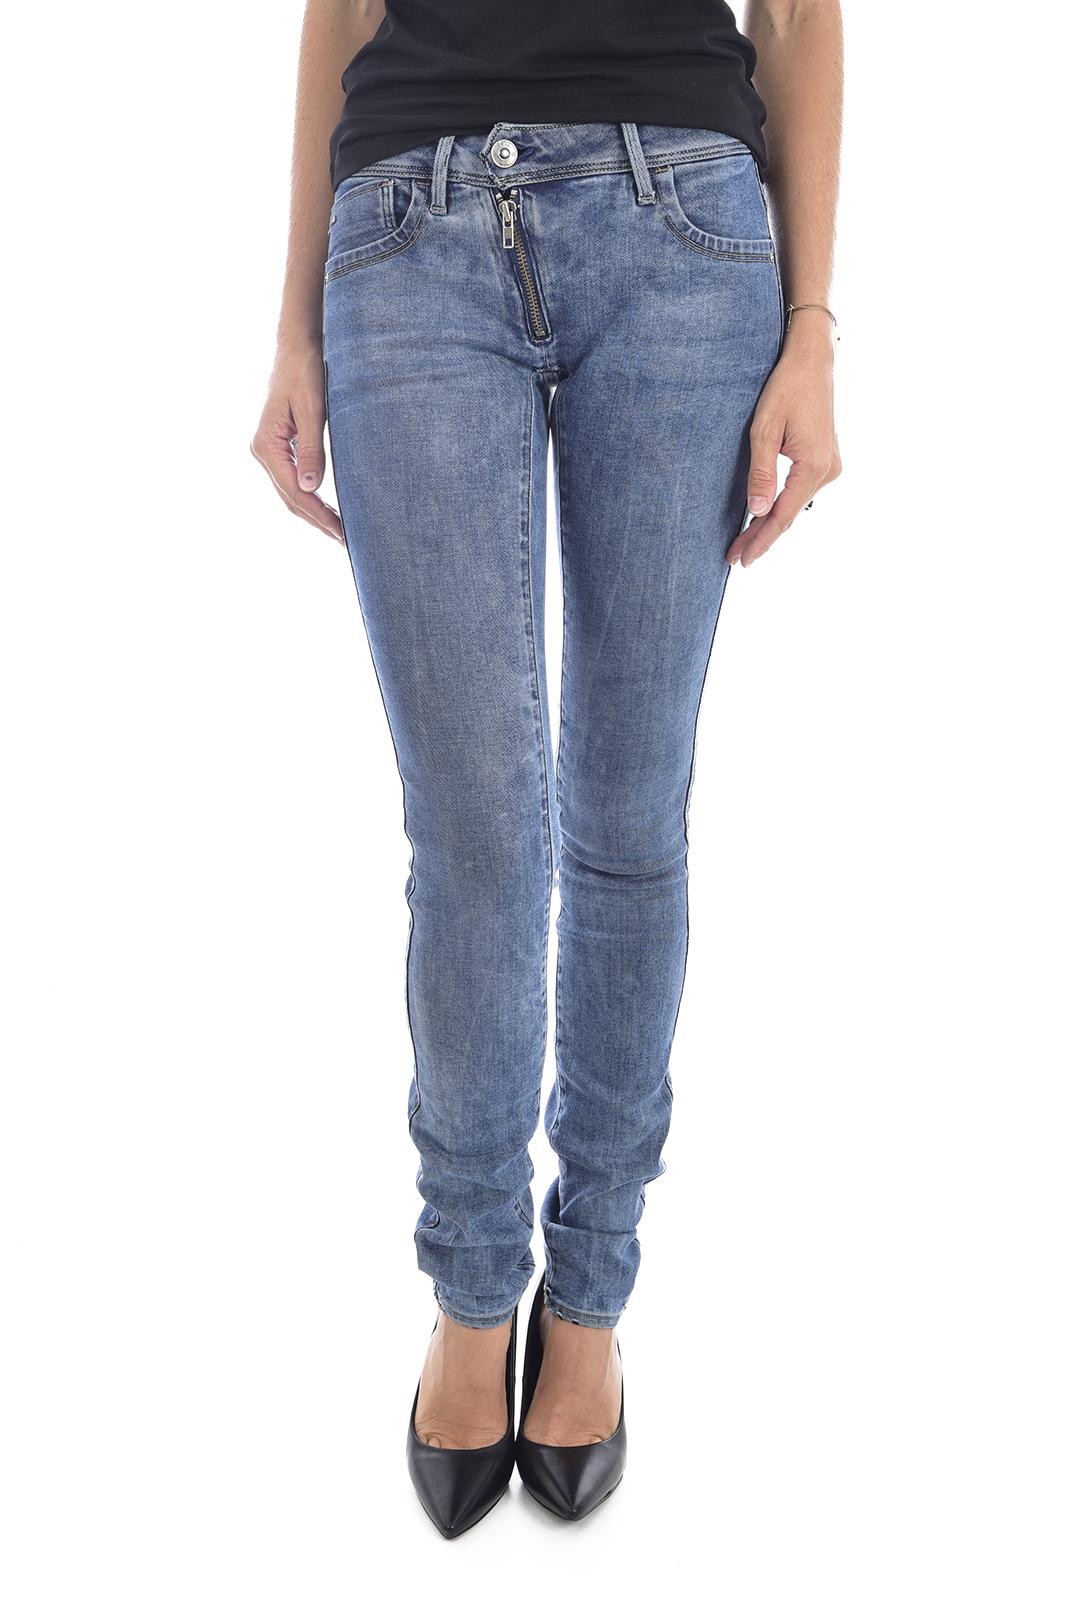 Jeans   G-star 60887-7802-071 lynn bleu